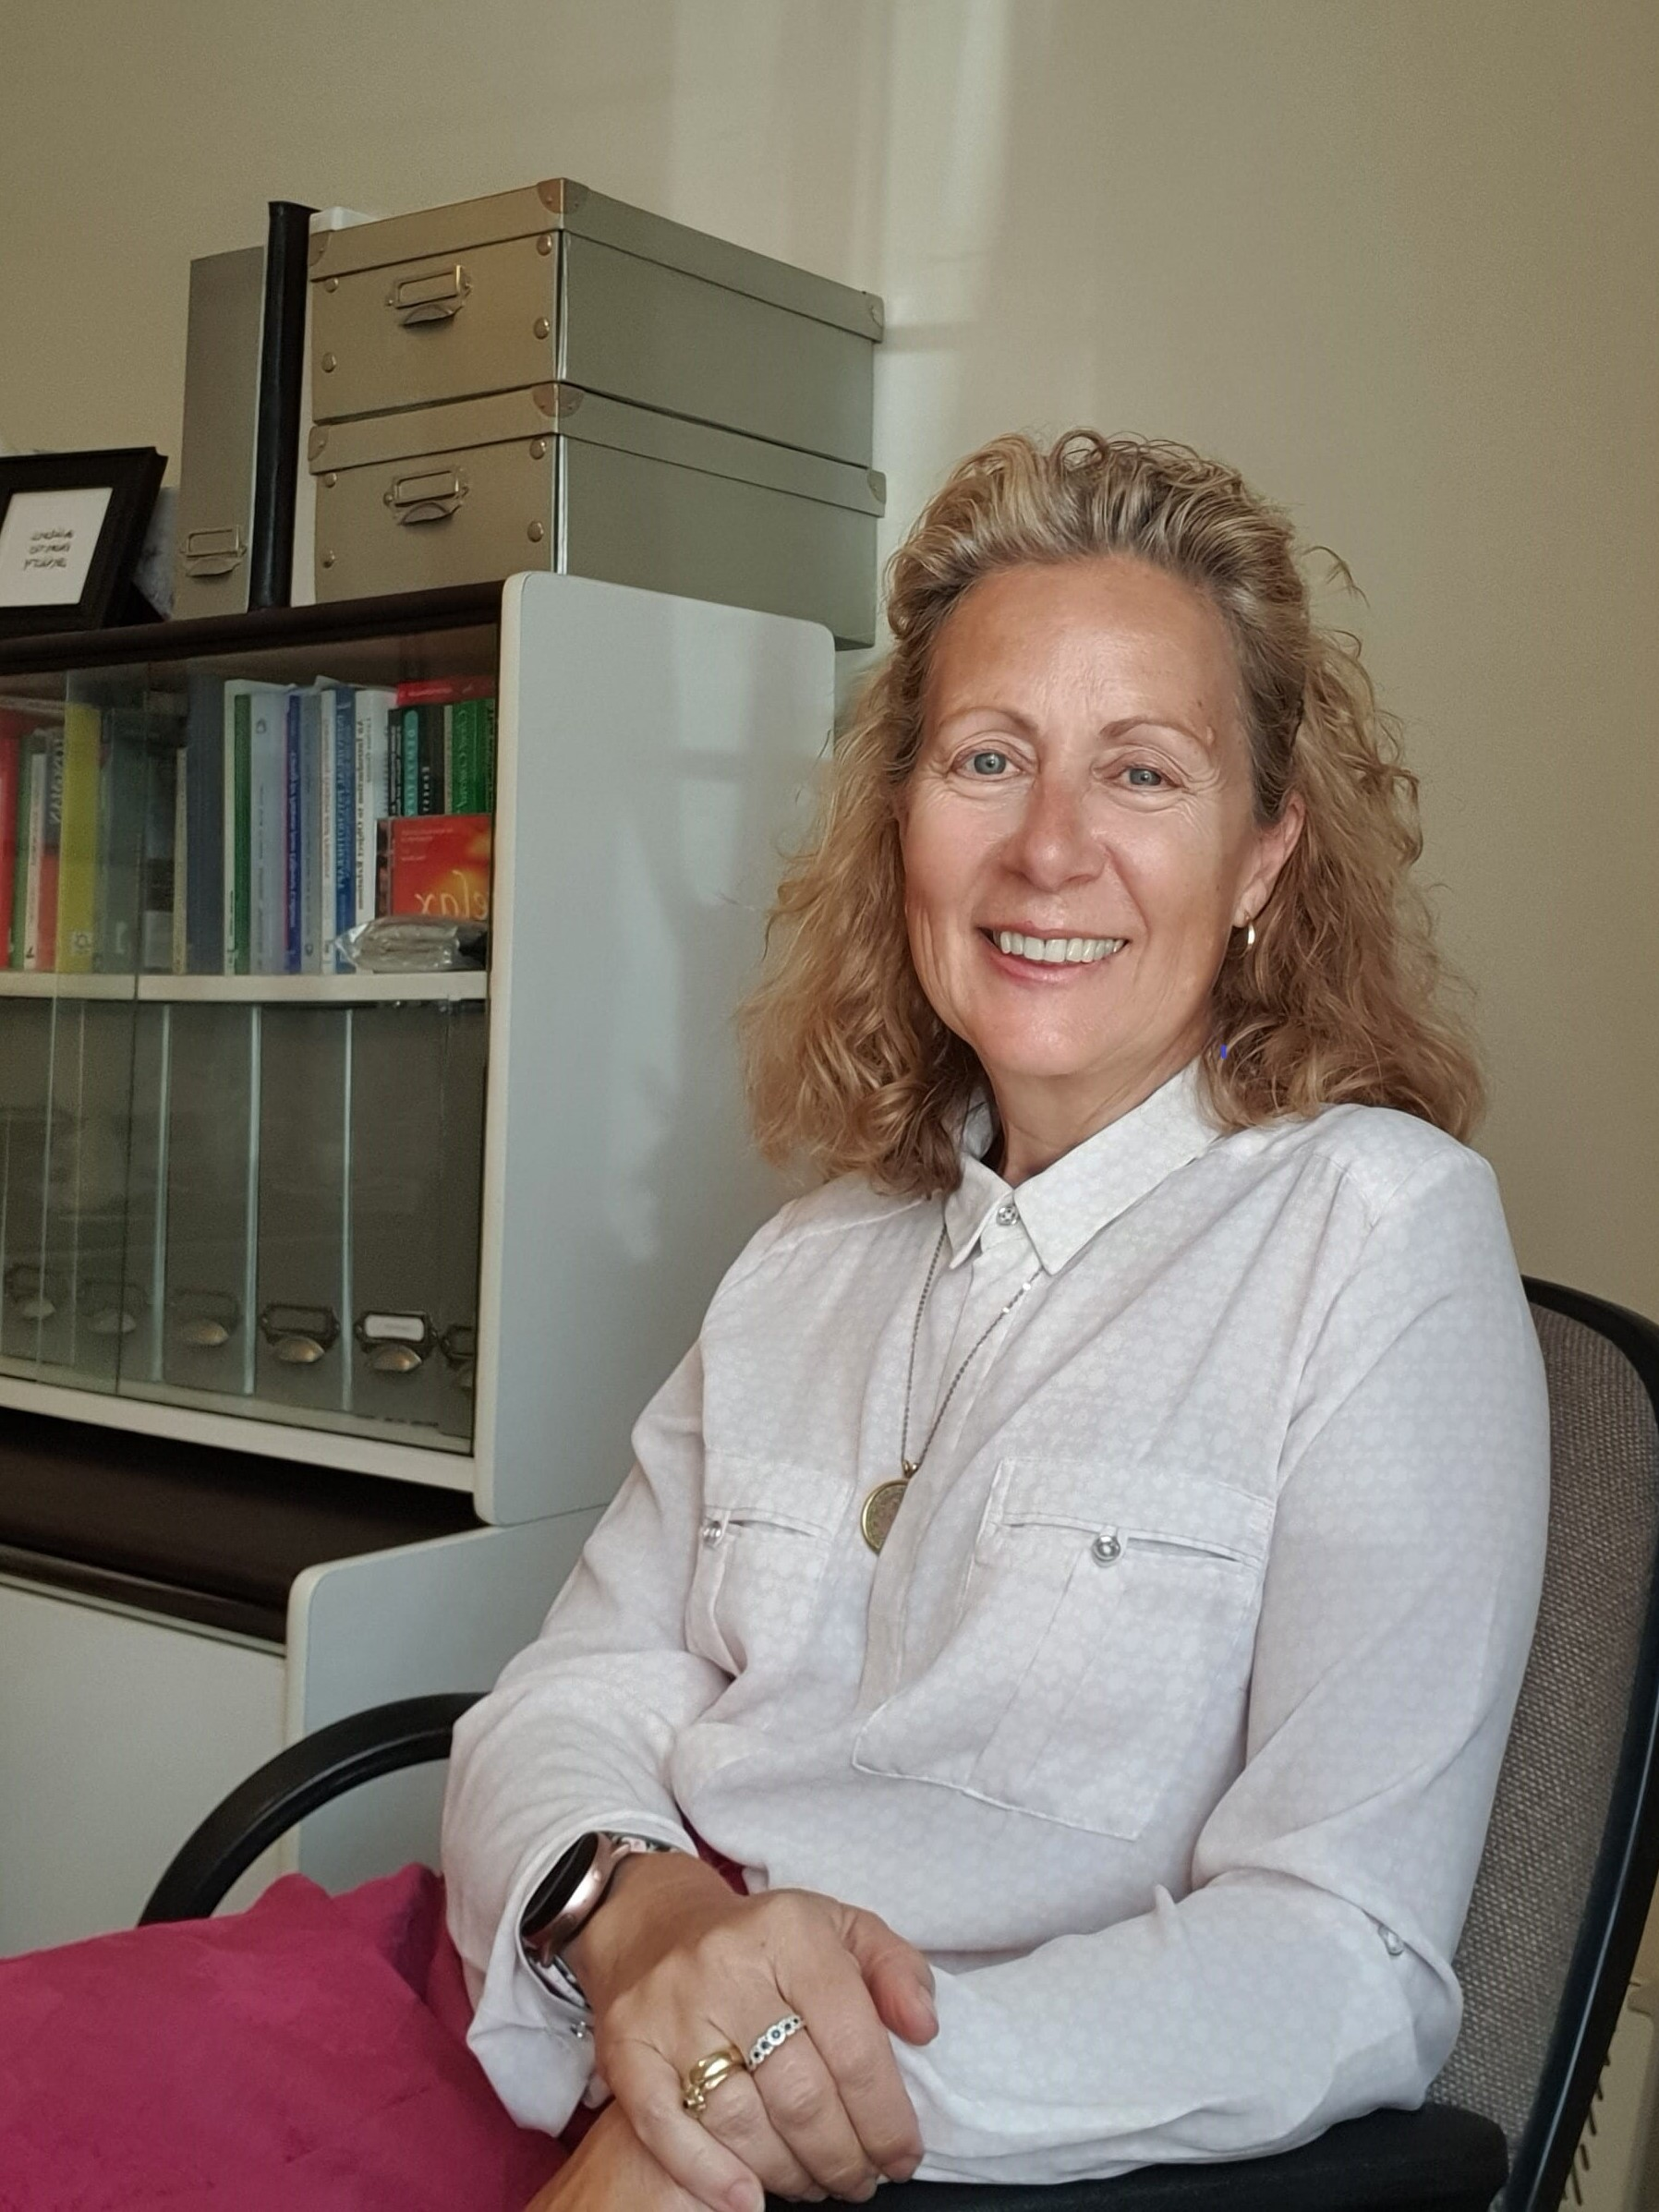 Karen Twyford